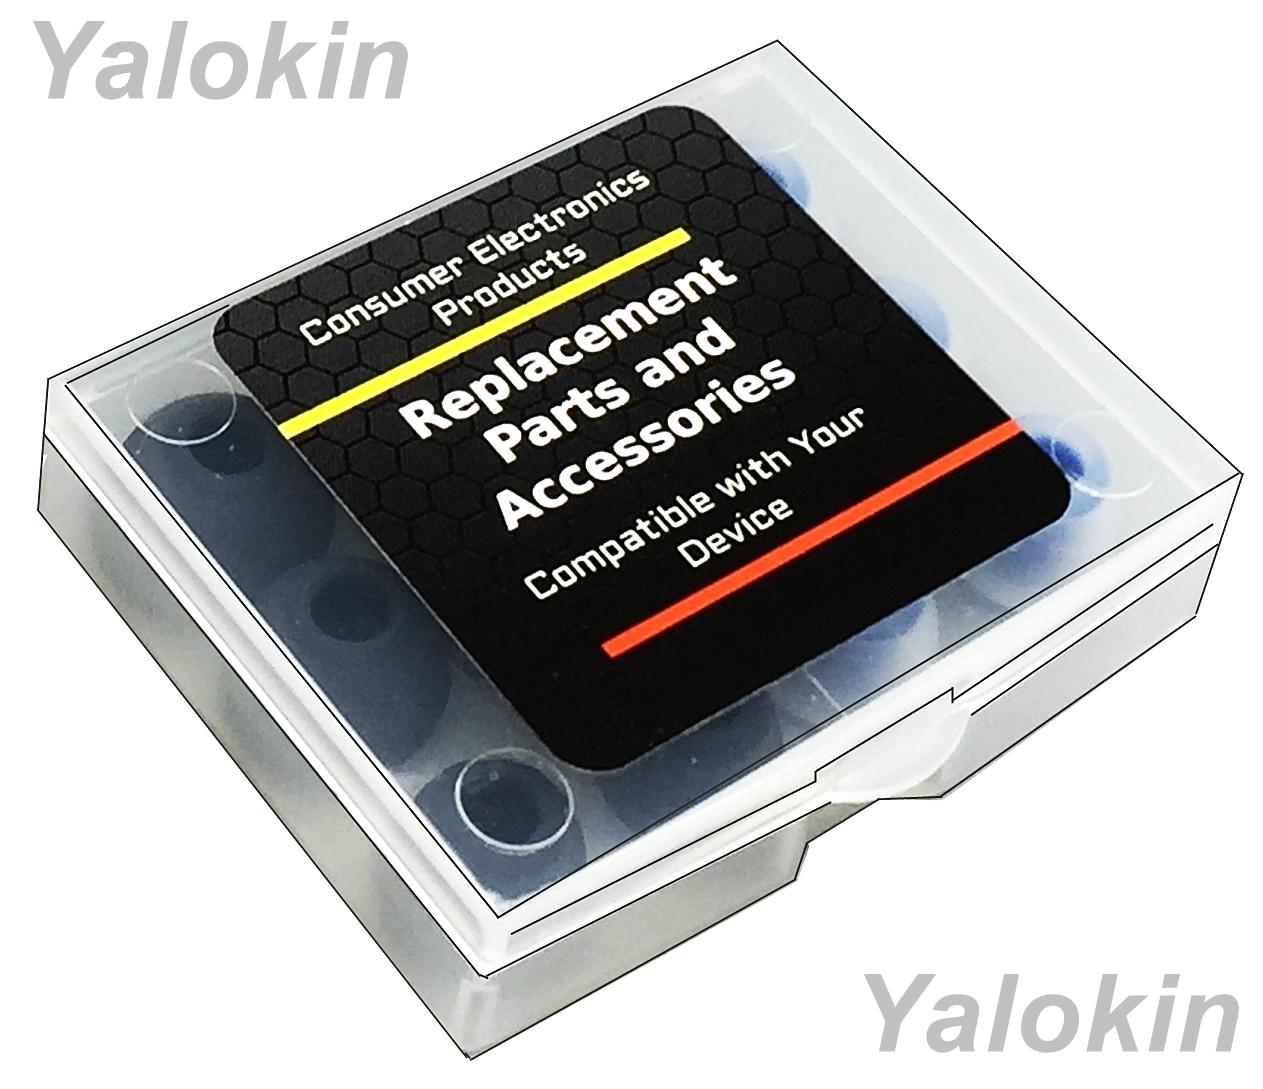 505422e05c5 8pcs (BMF-BP) Medium Memory Foam & Silicone Tips for Jaybird X3,